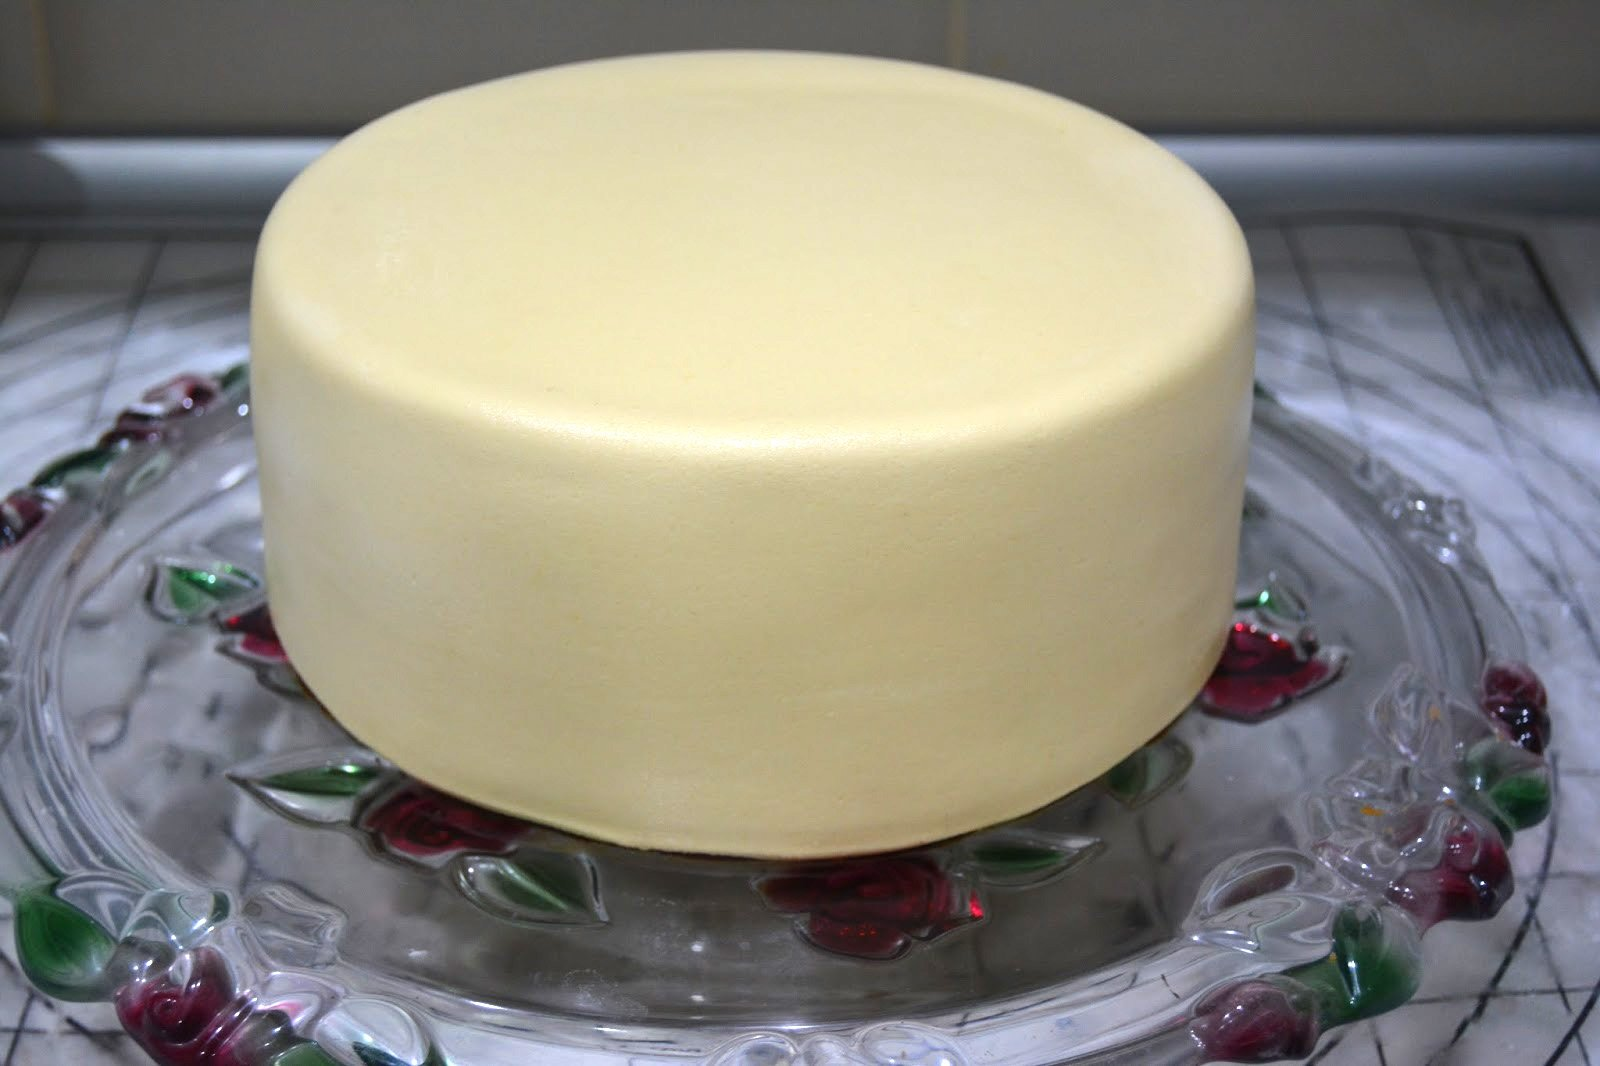 фотографе торт под мастику рецепт с фото пошагово балконов